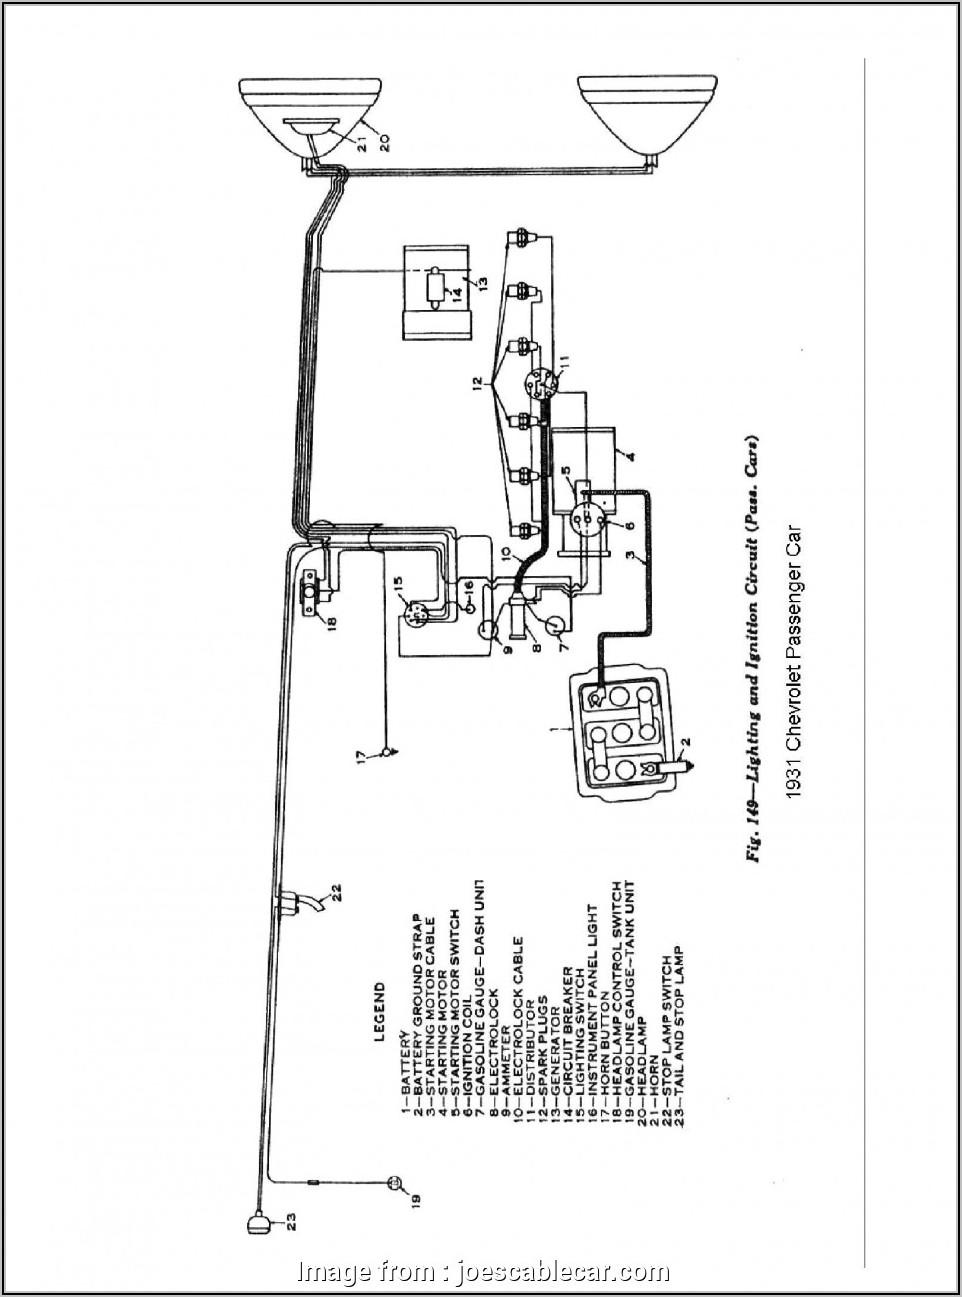 7 Pin Round Trailer Plug Wiring Diagram Nz